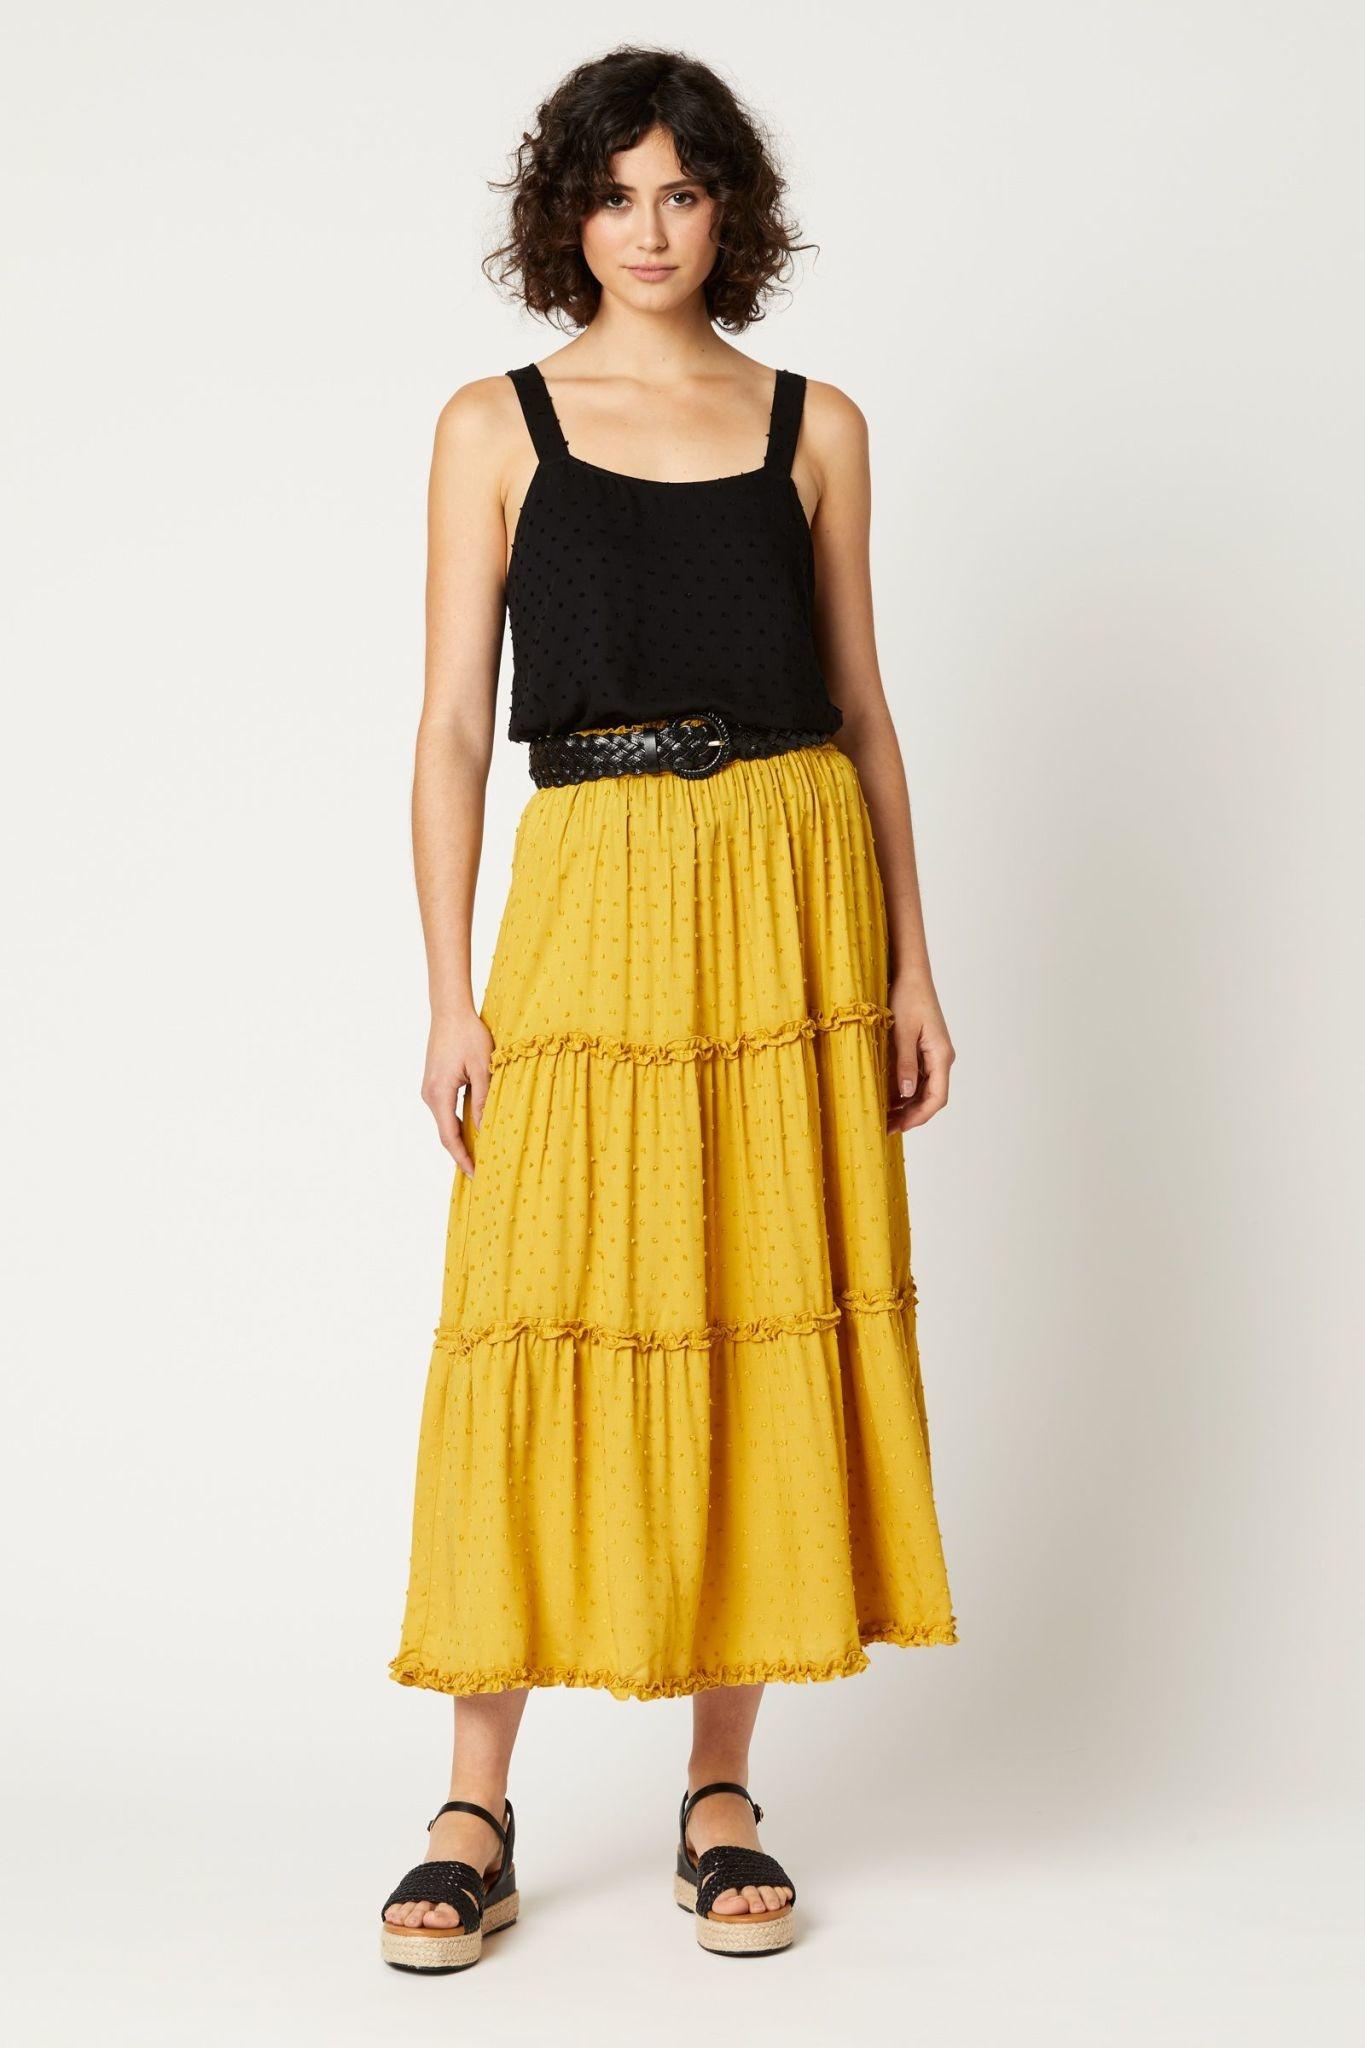 Eb & Ive Jungle Maxi Skirt